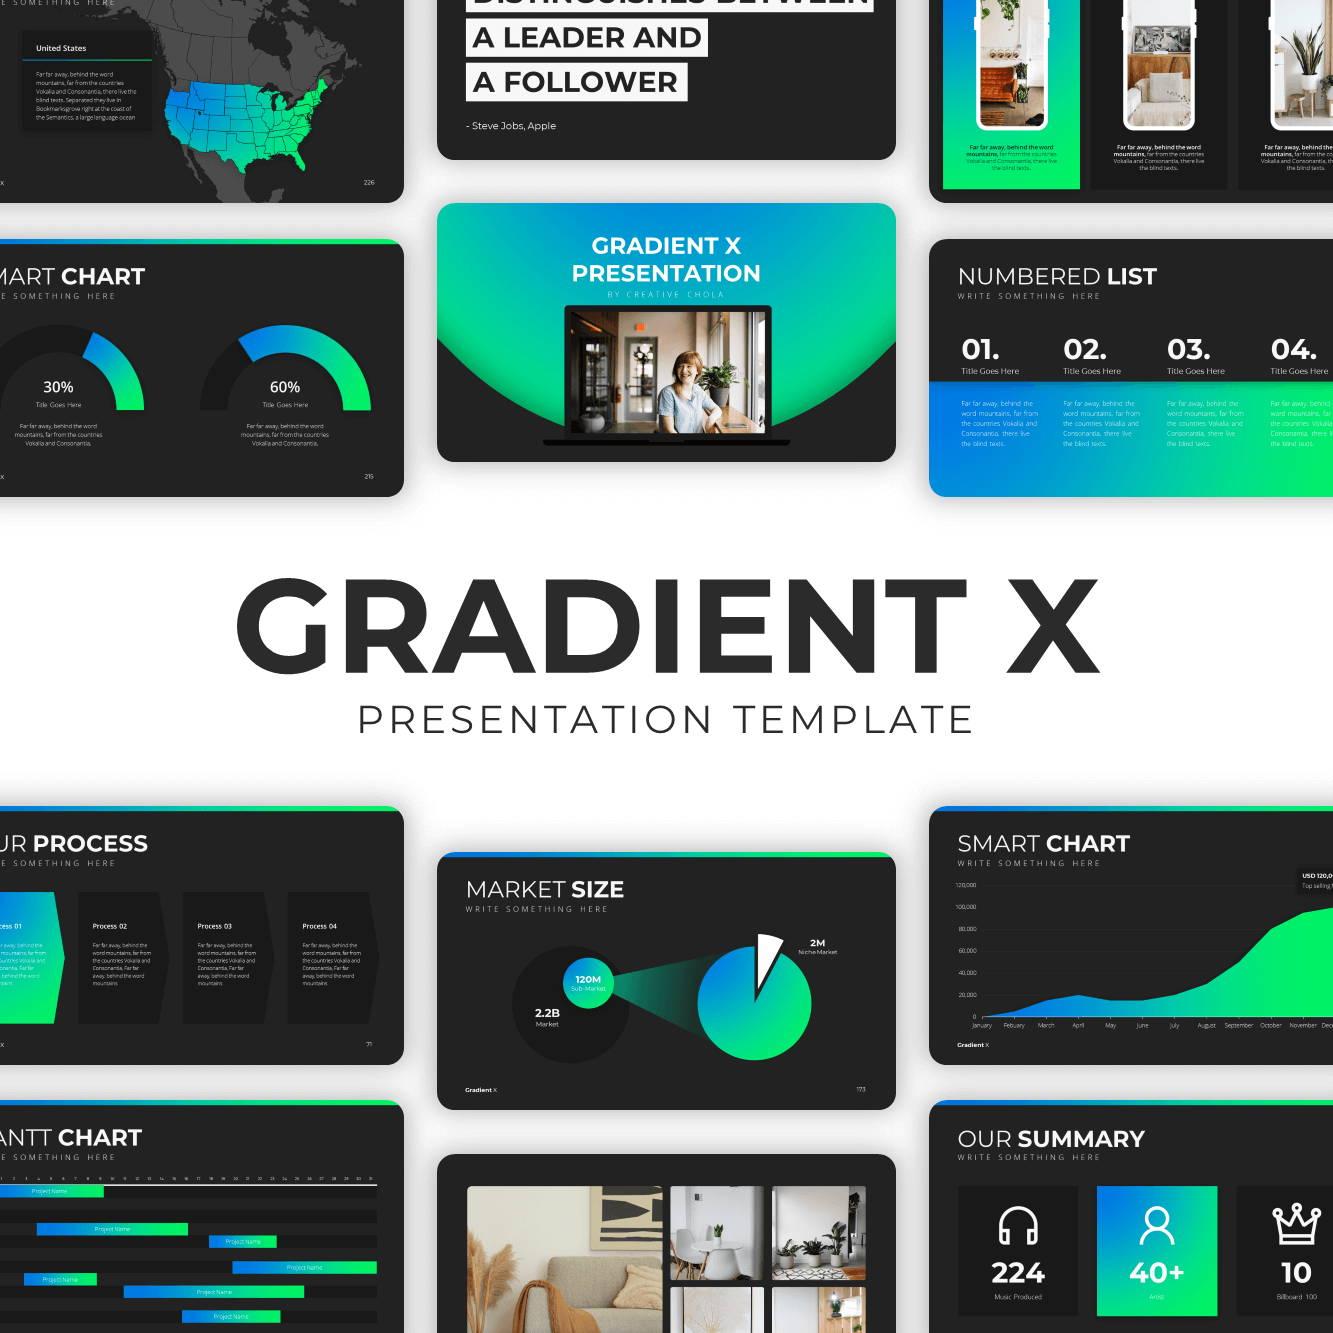 best powerpoint presentation template, modern powerpoint presentation template, professional powerpoint presentation template